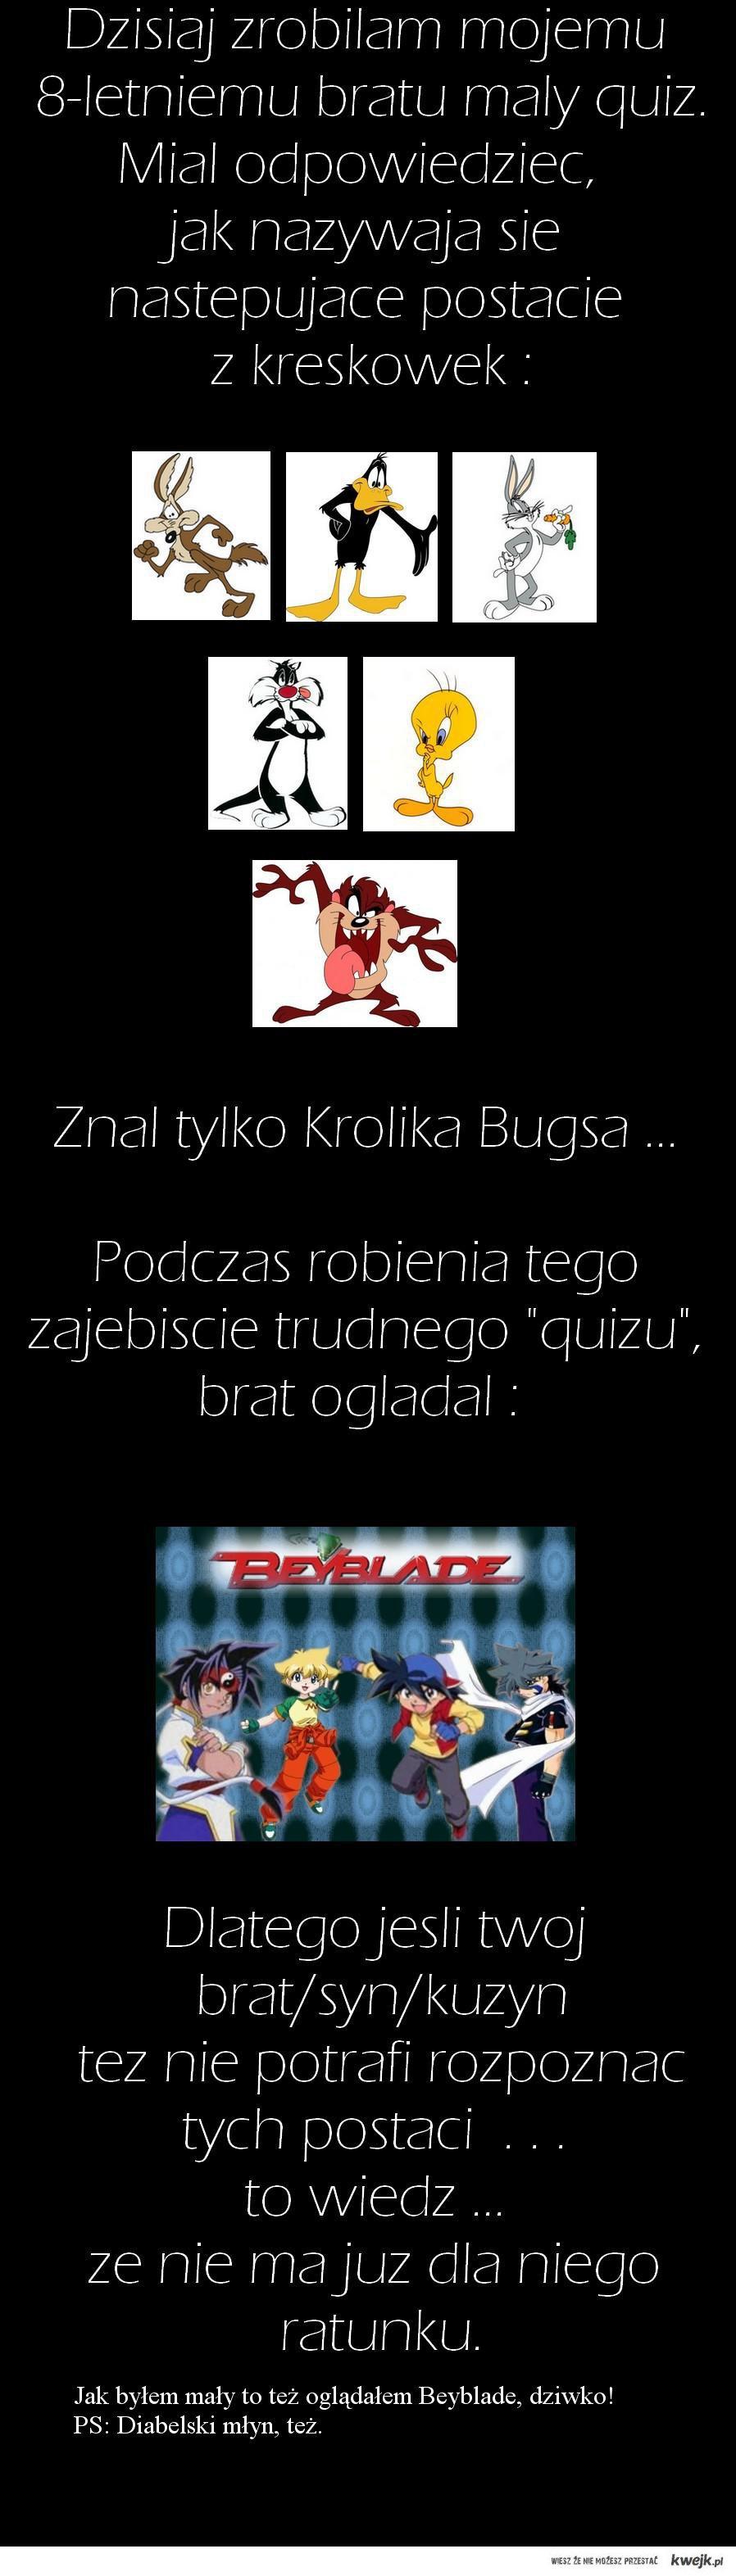 dwadwad2121